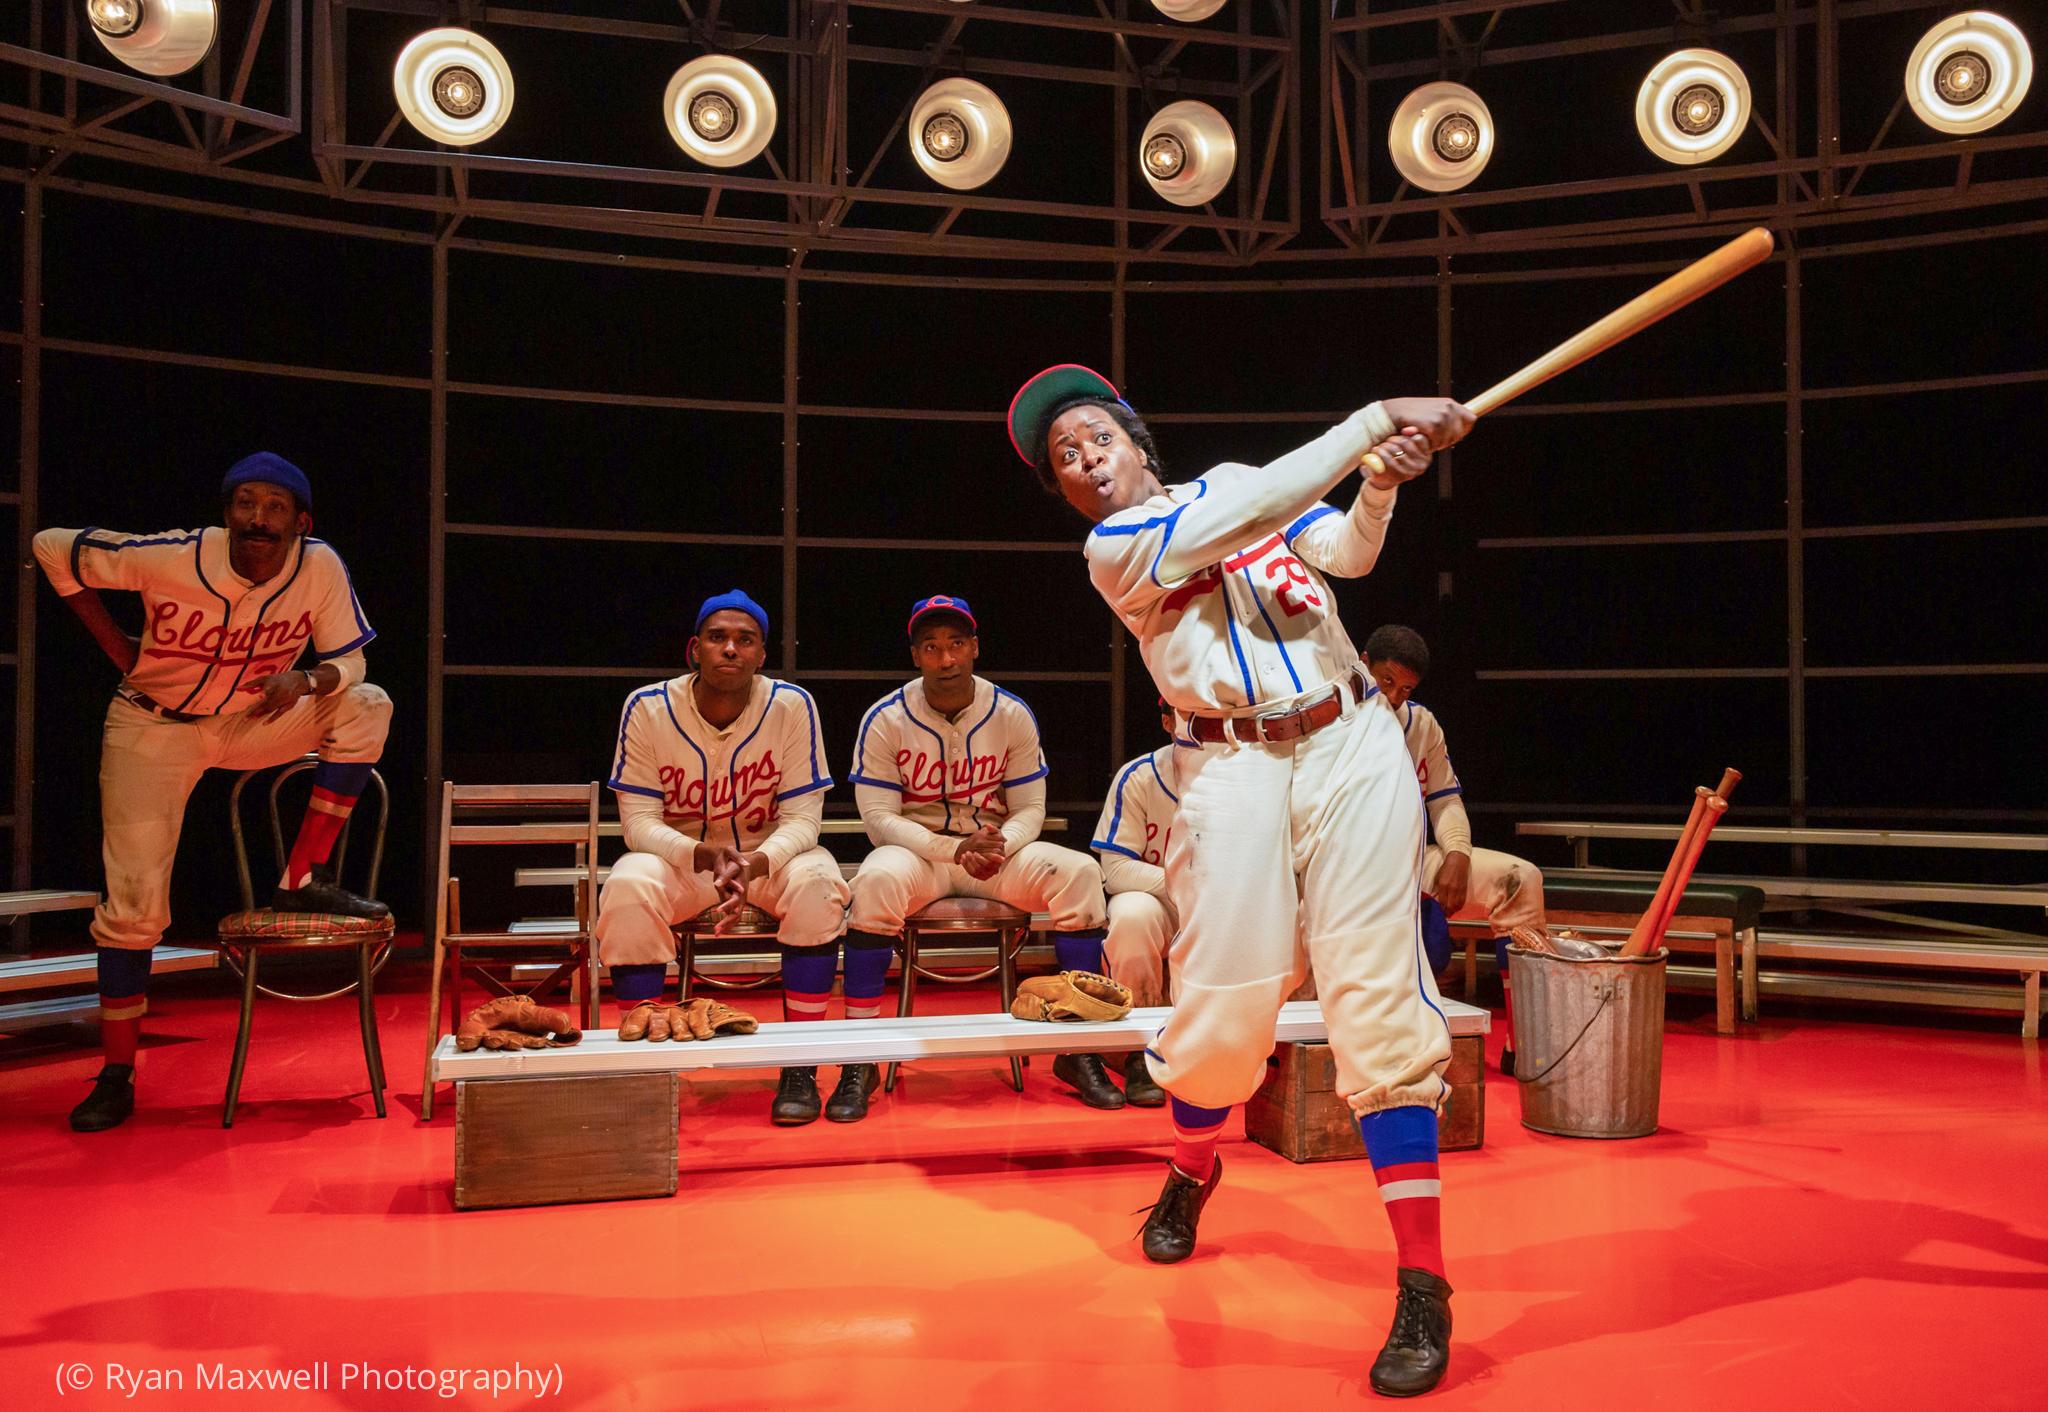 Female actor in baseball uniform swinging bat (© Ryan Maxwell Photography)